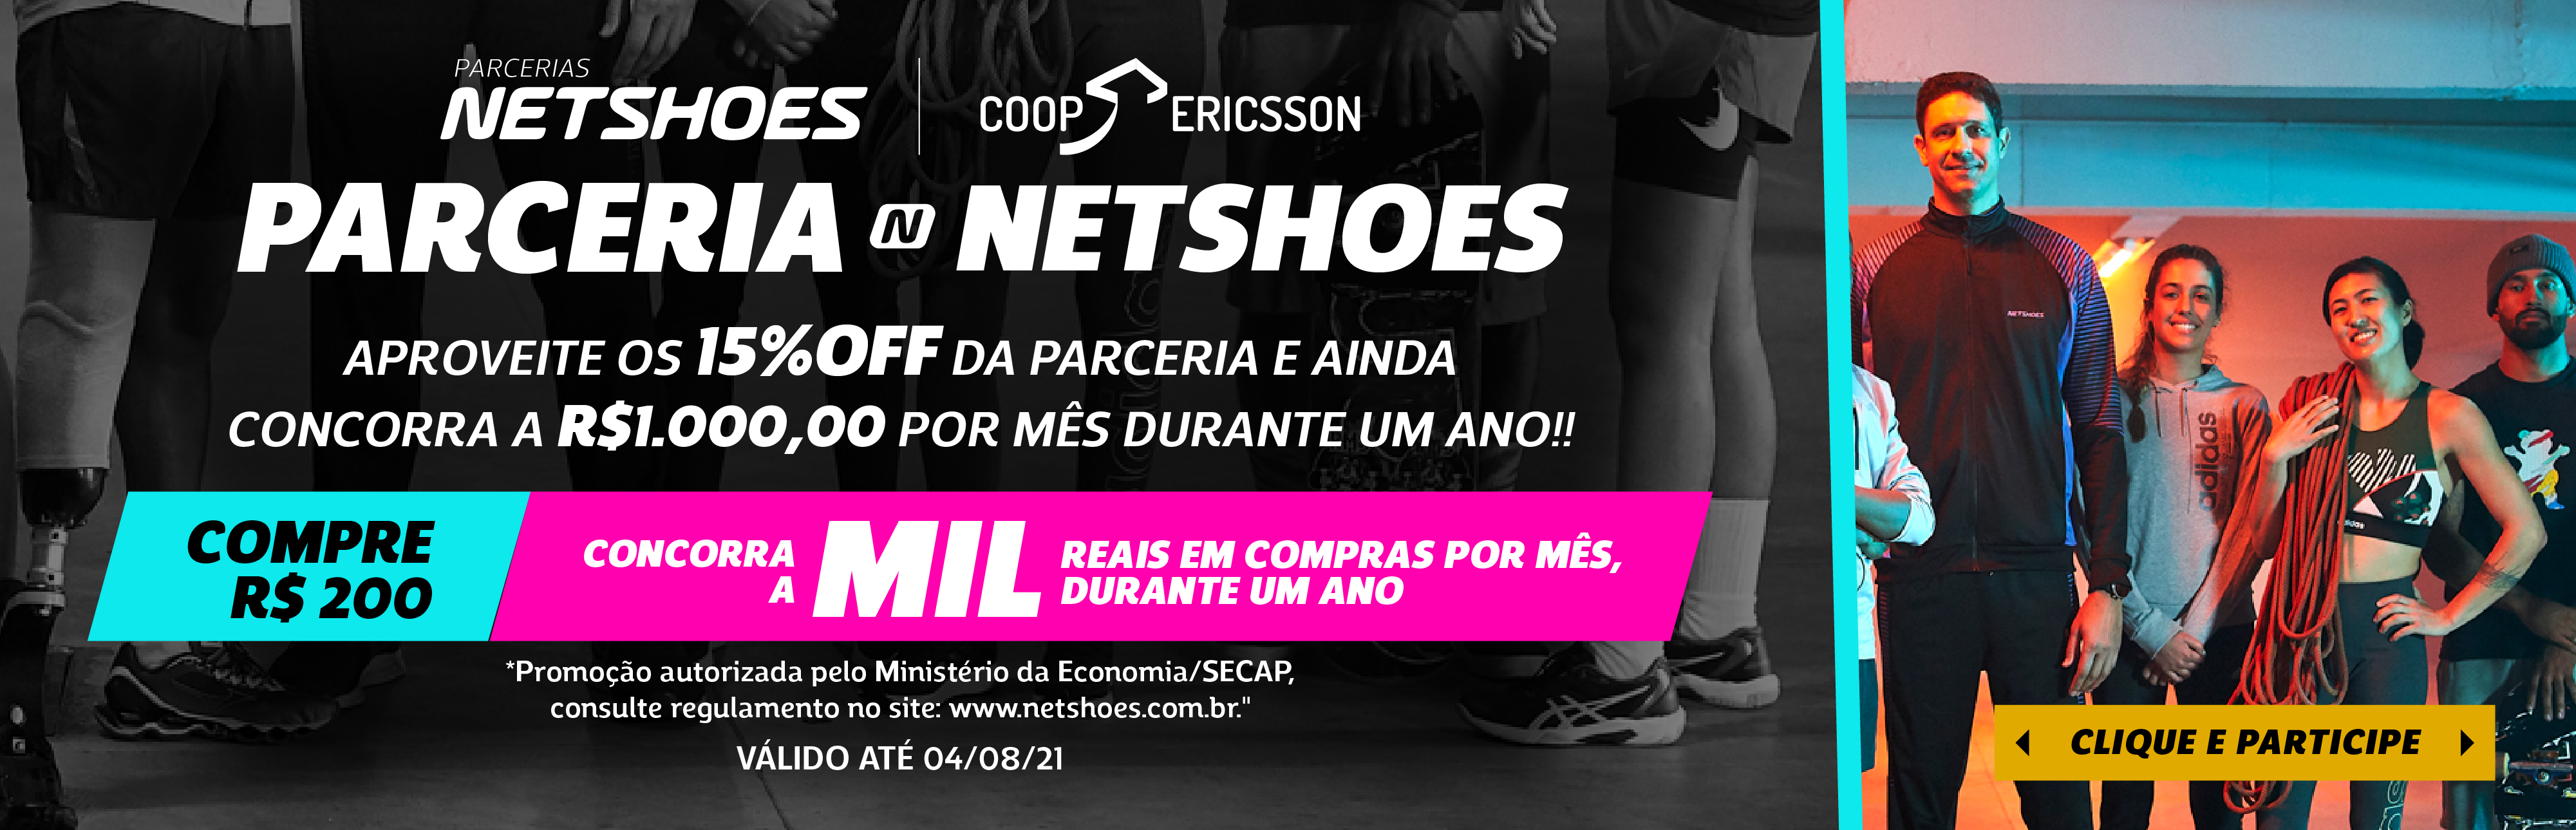 Parceria Netshoes